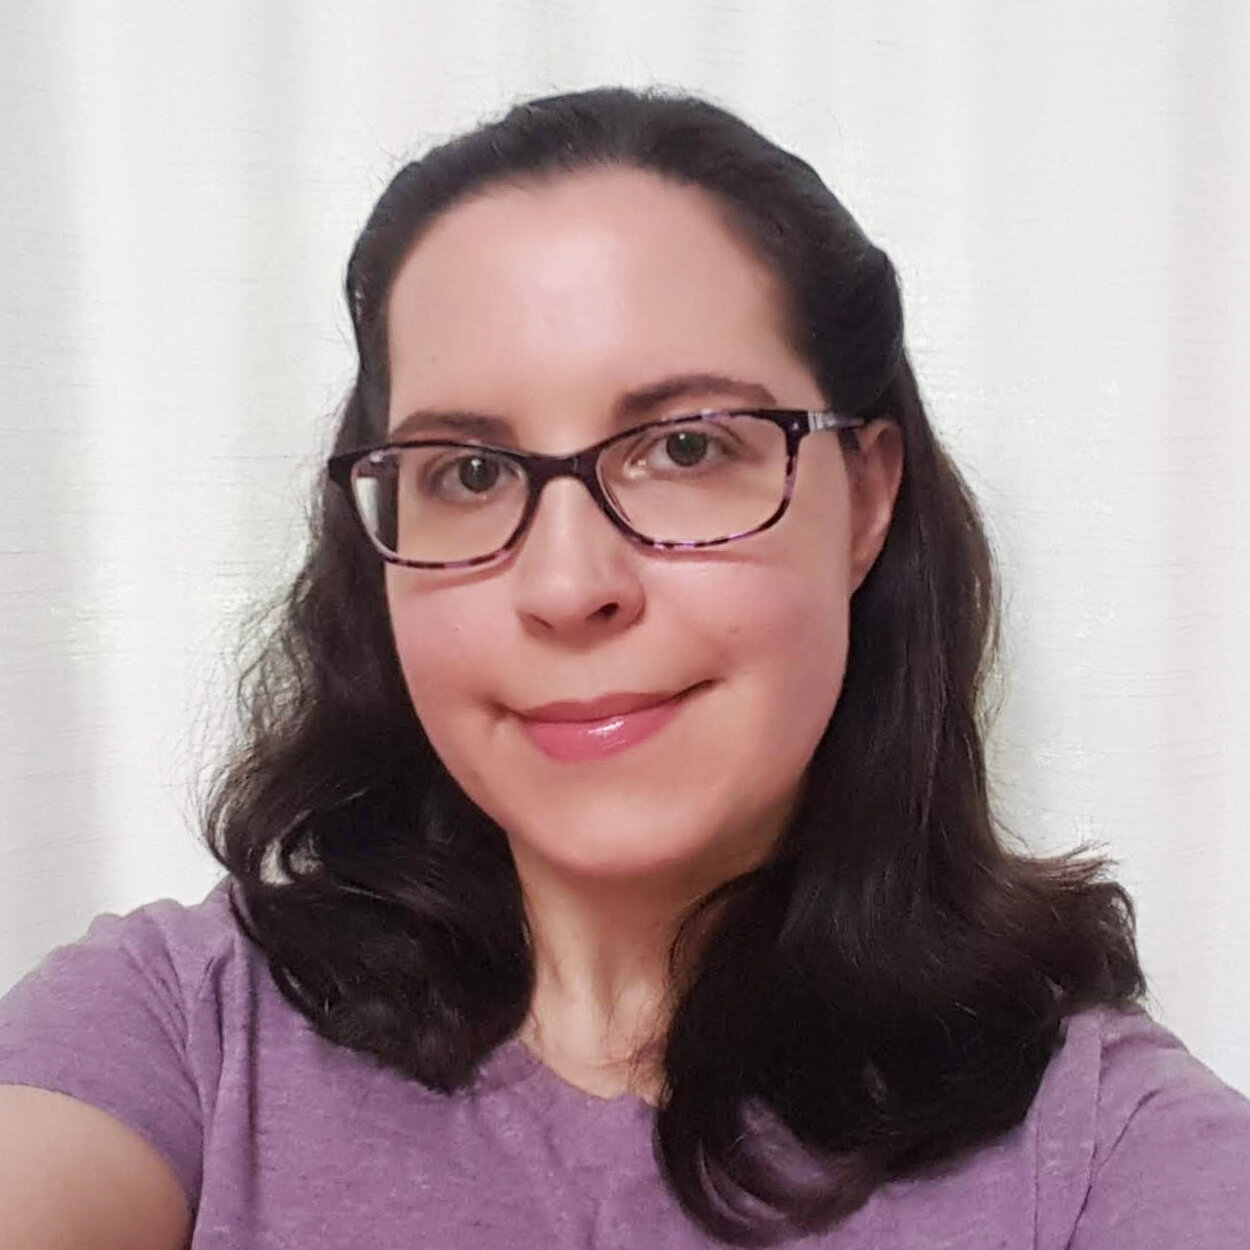 Valerie Mickell - Postpartum Doulawebsite • doulamatch • fb